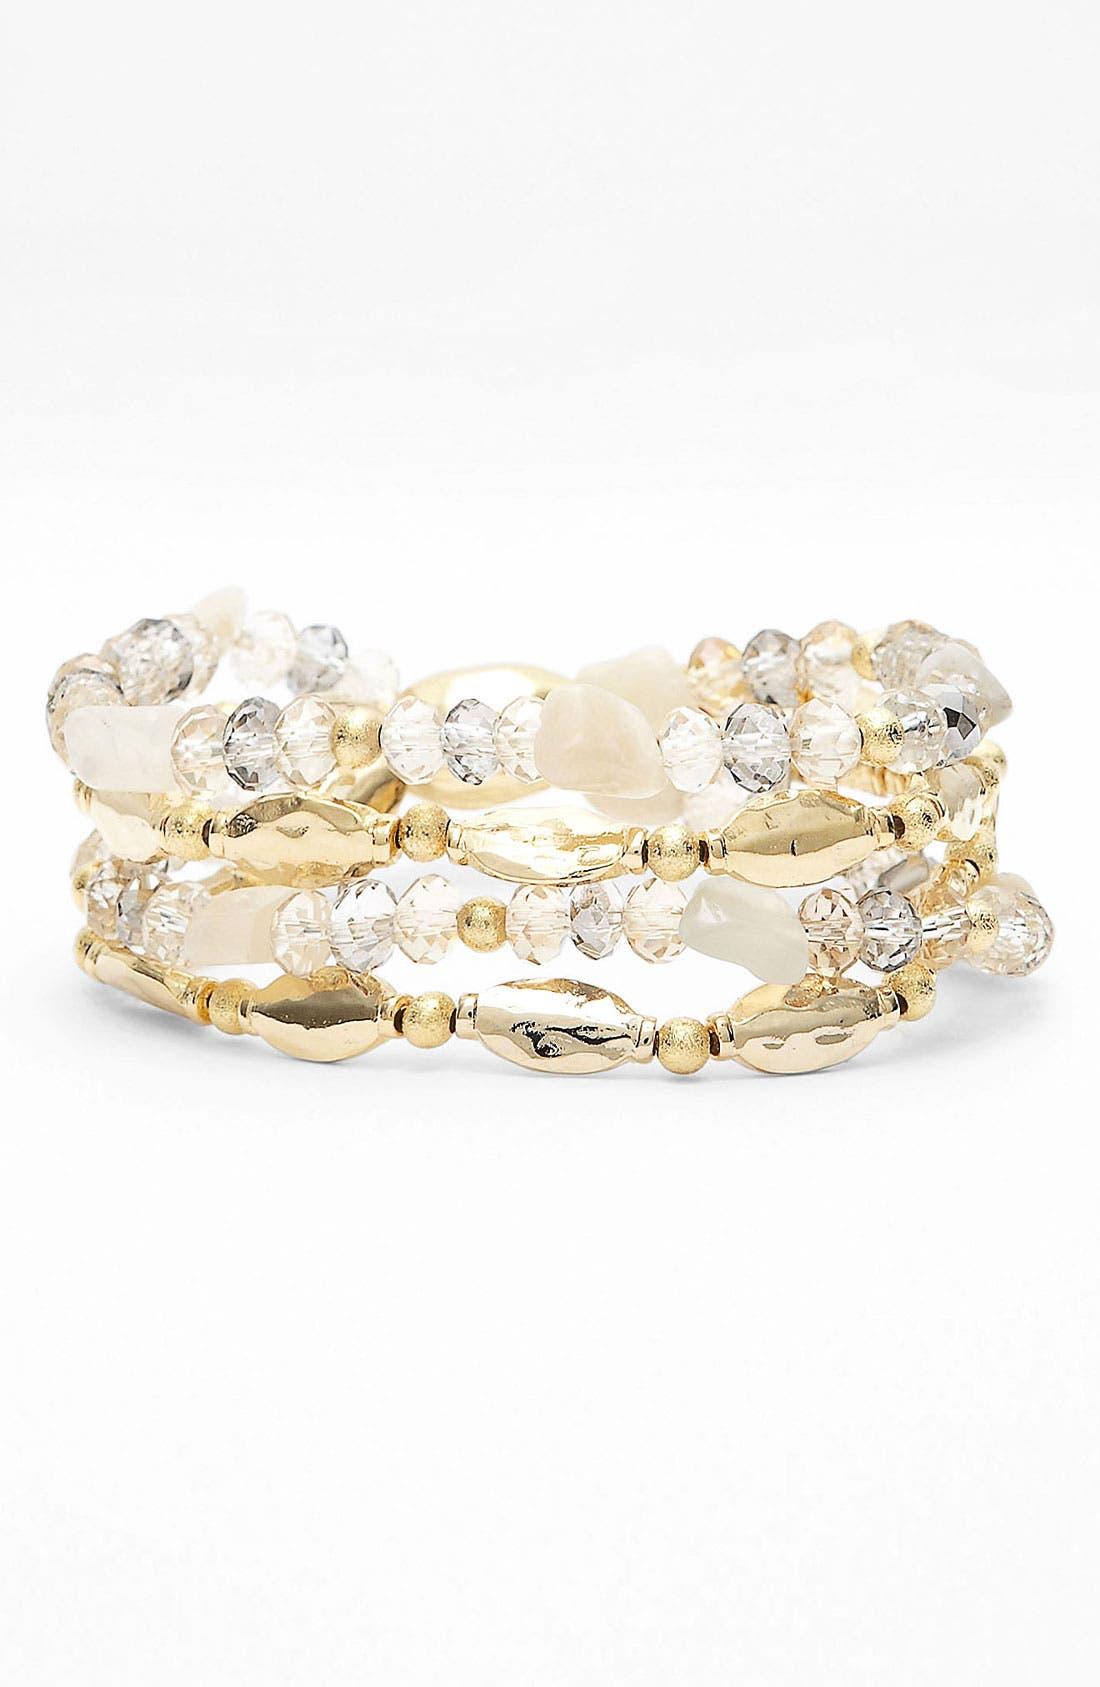 Main Image - Nordstrom 'Sand Dollar' Bead Stretch Bracelets (Set of 4)